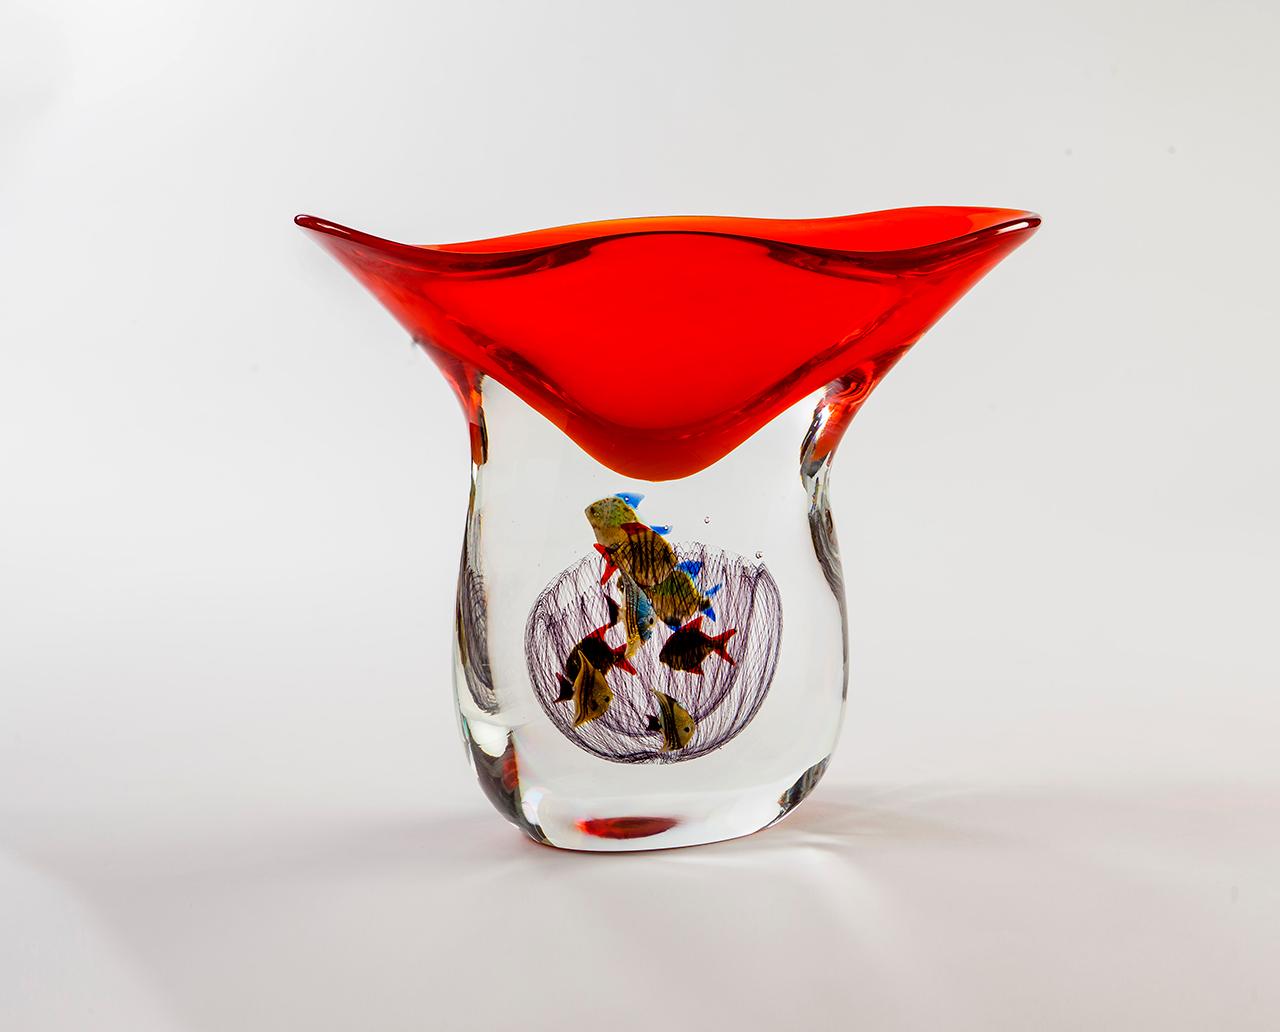 vaso-acquario-vetro-murano-schiavon